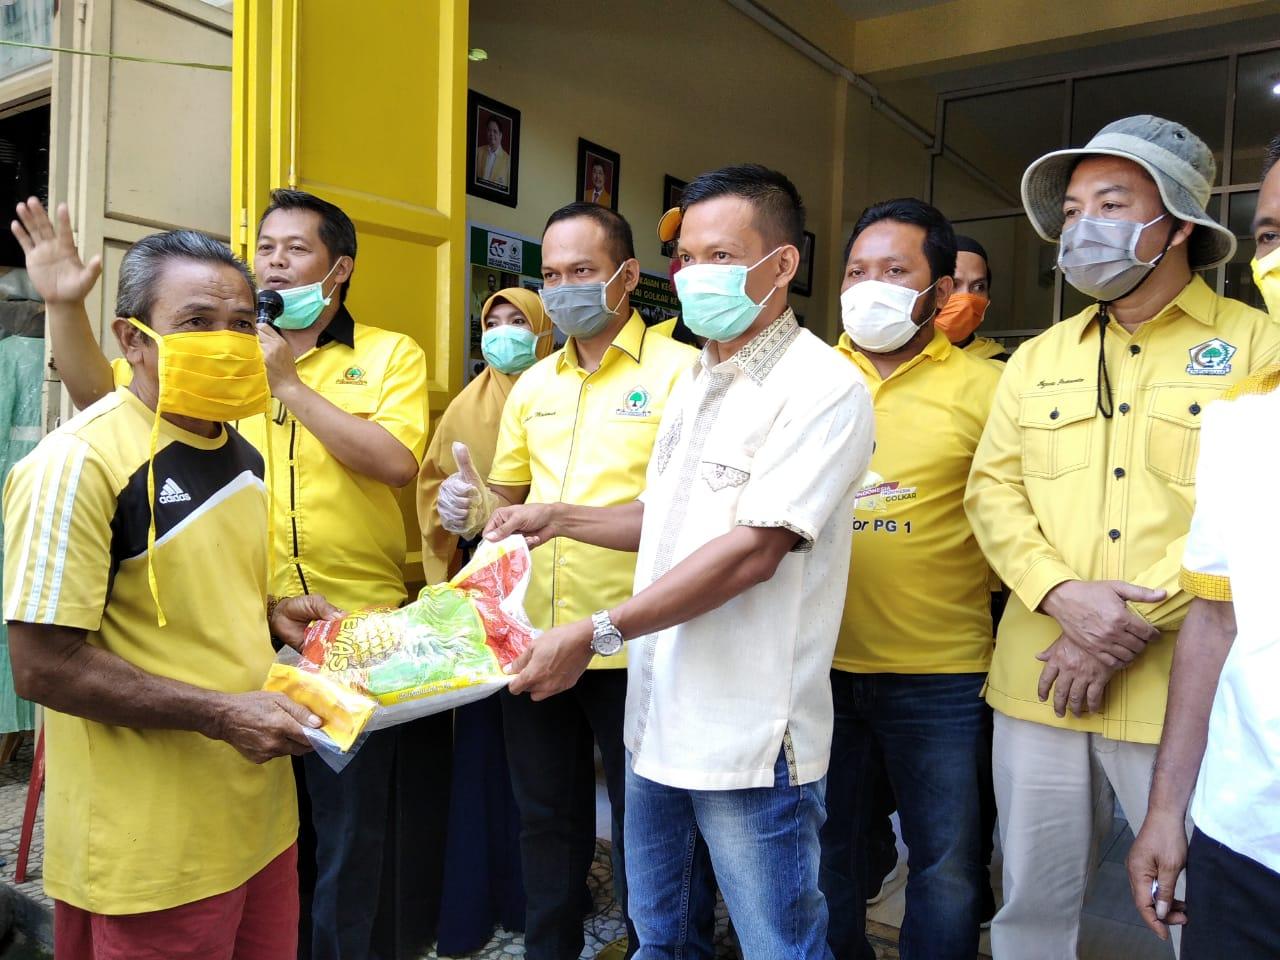 Pembagian Sembako dan Masker oleh Pengurus Dewan pimpinan daerah (DPD) Golkar Polman